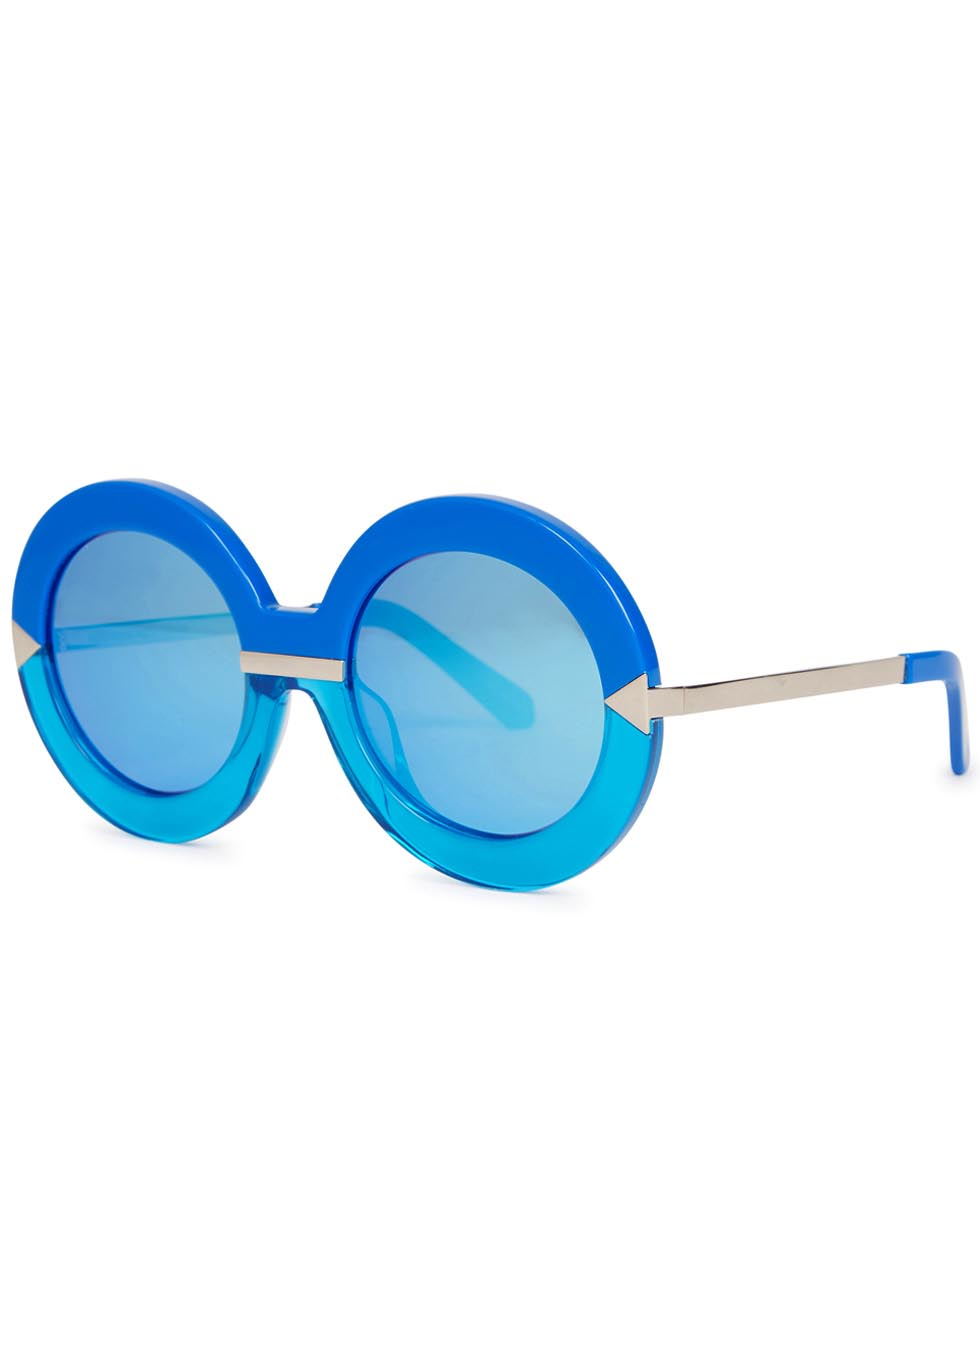 Karen Walker Hollywood Pool Round-frame Sunglasses in Blue - Lyst